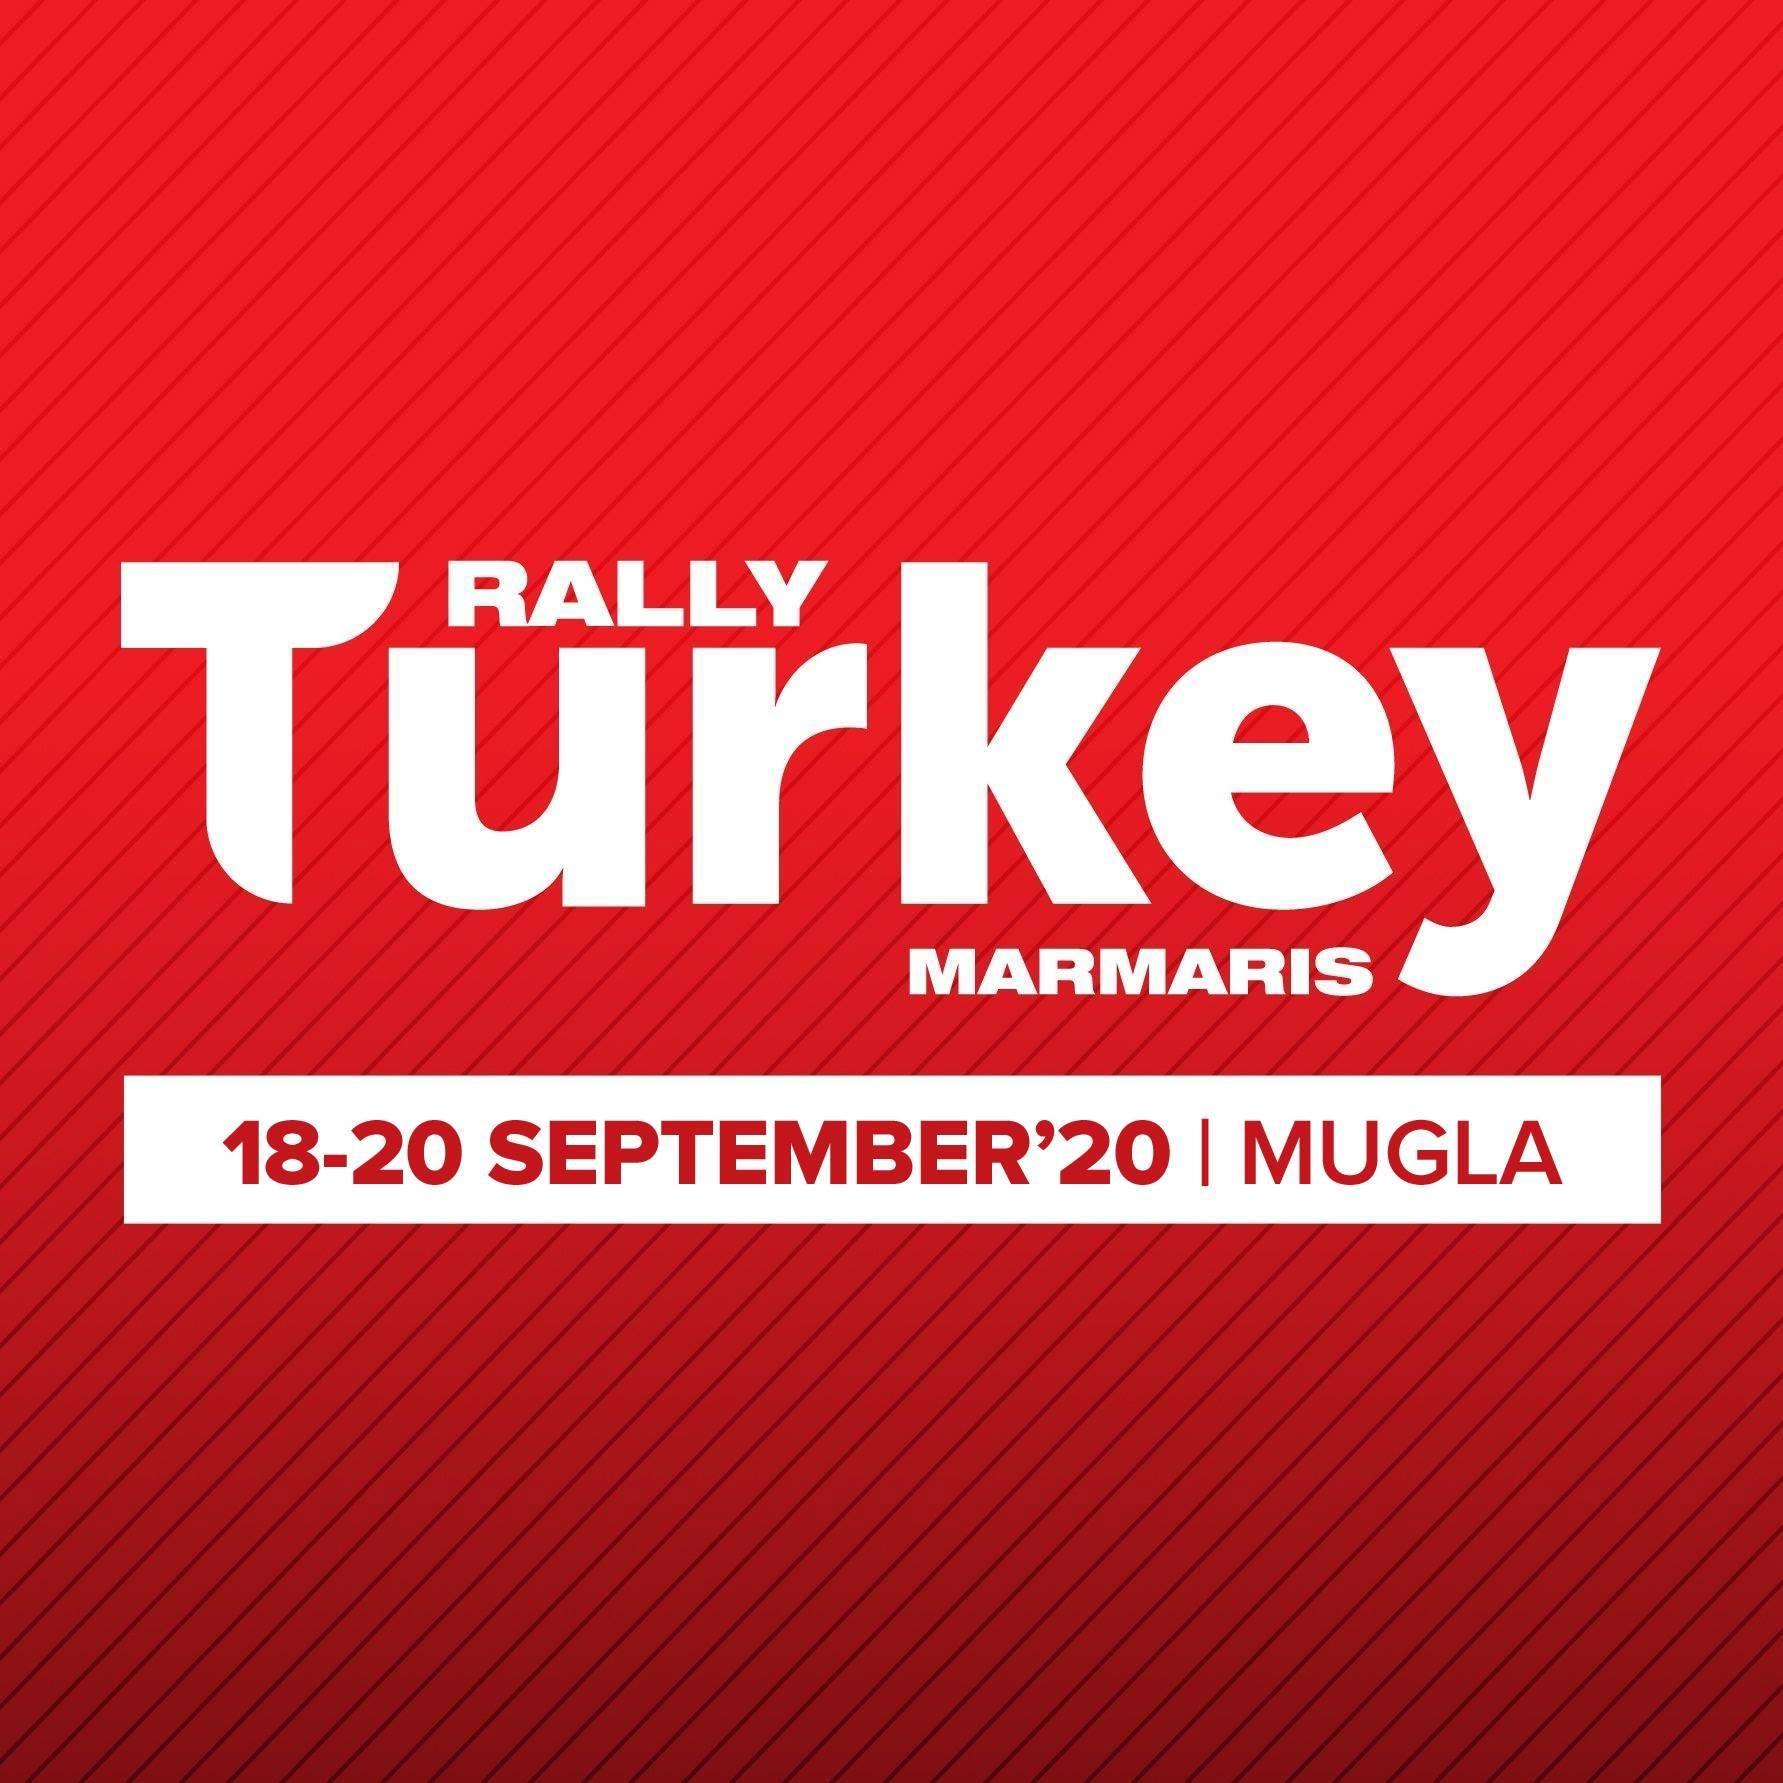 2020 World Rally Championship - Rally of Turkey